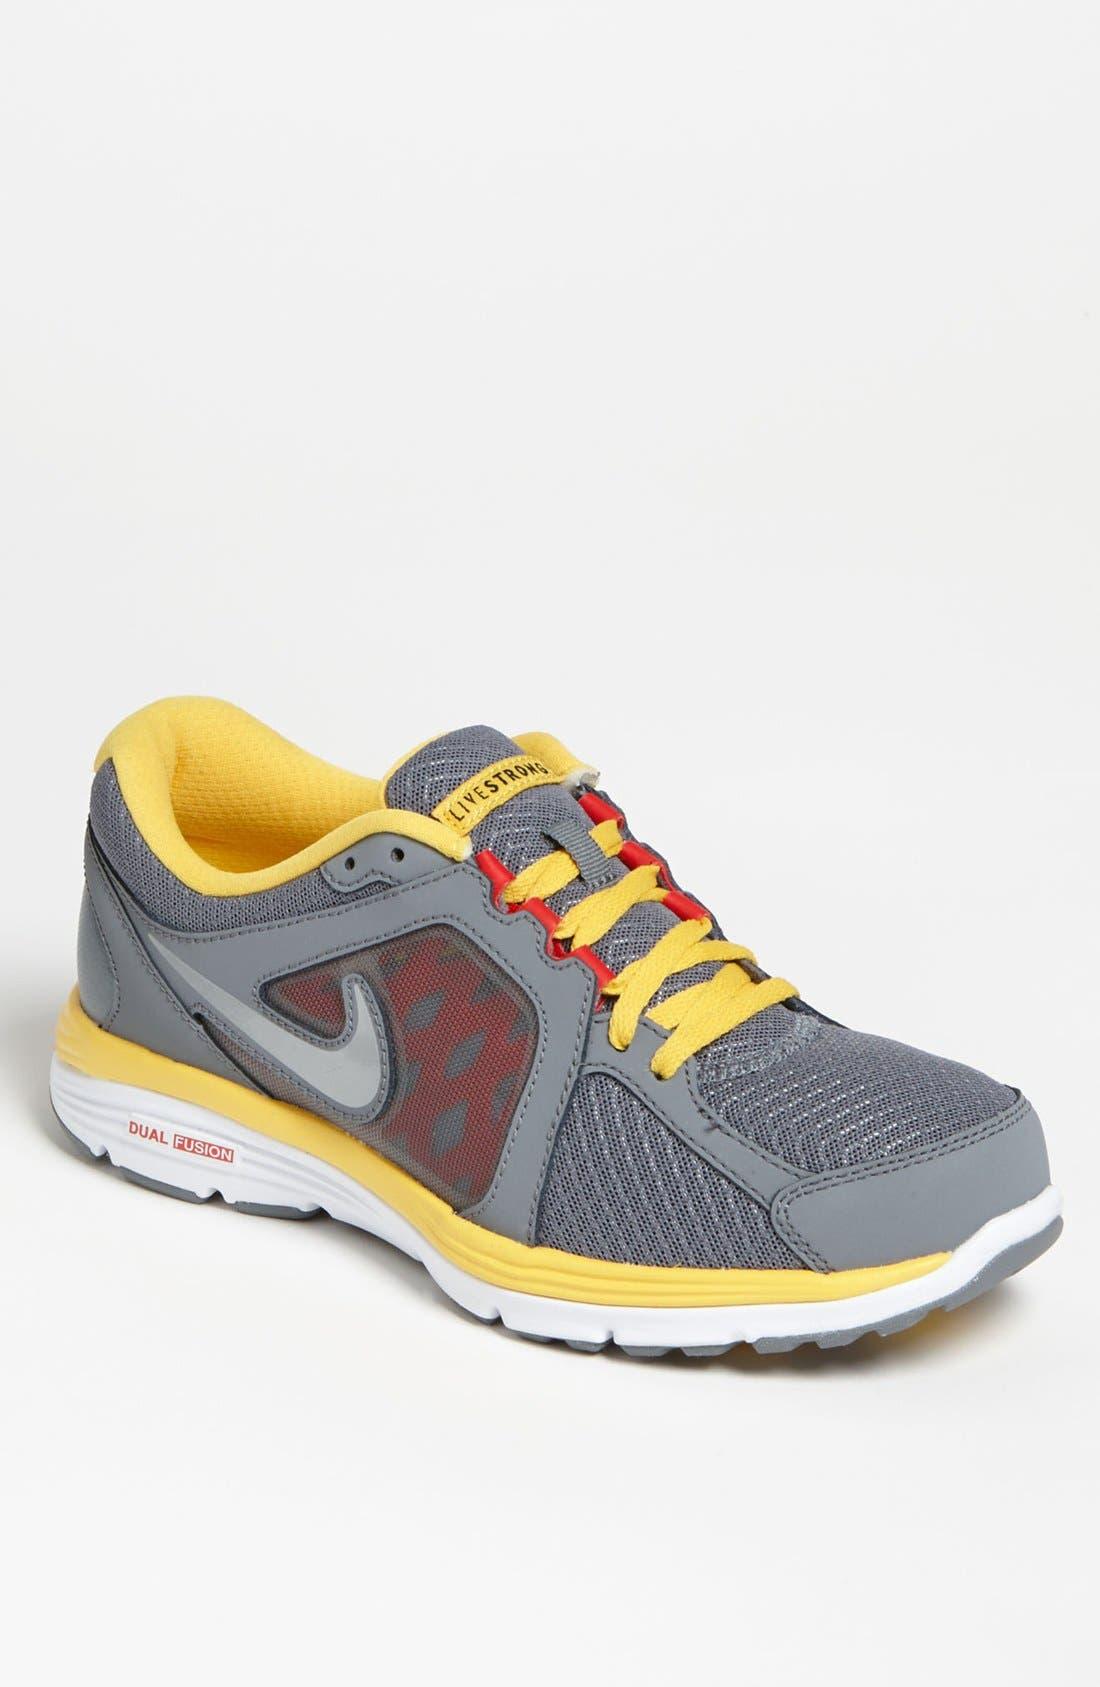 Alternate Image 1 Selected - Nike 'Dual Fusion Run Livestrong' Running Shoe (Men)